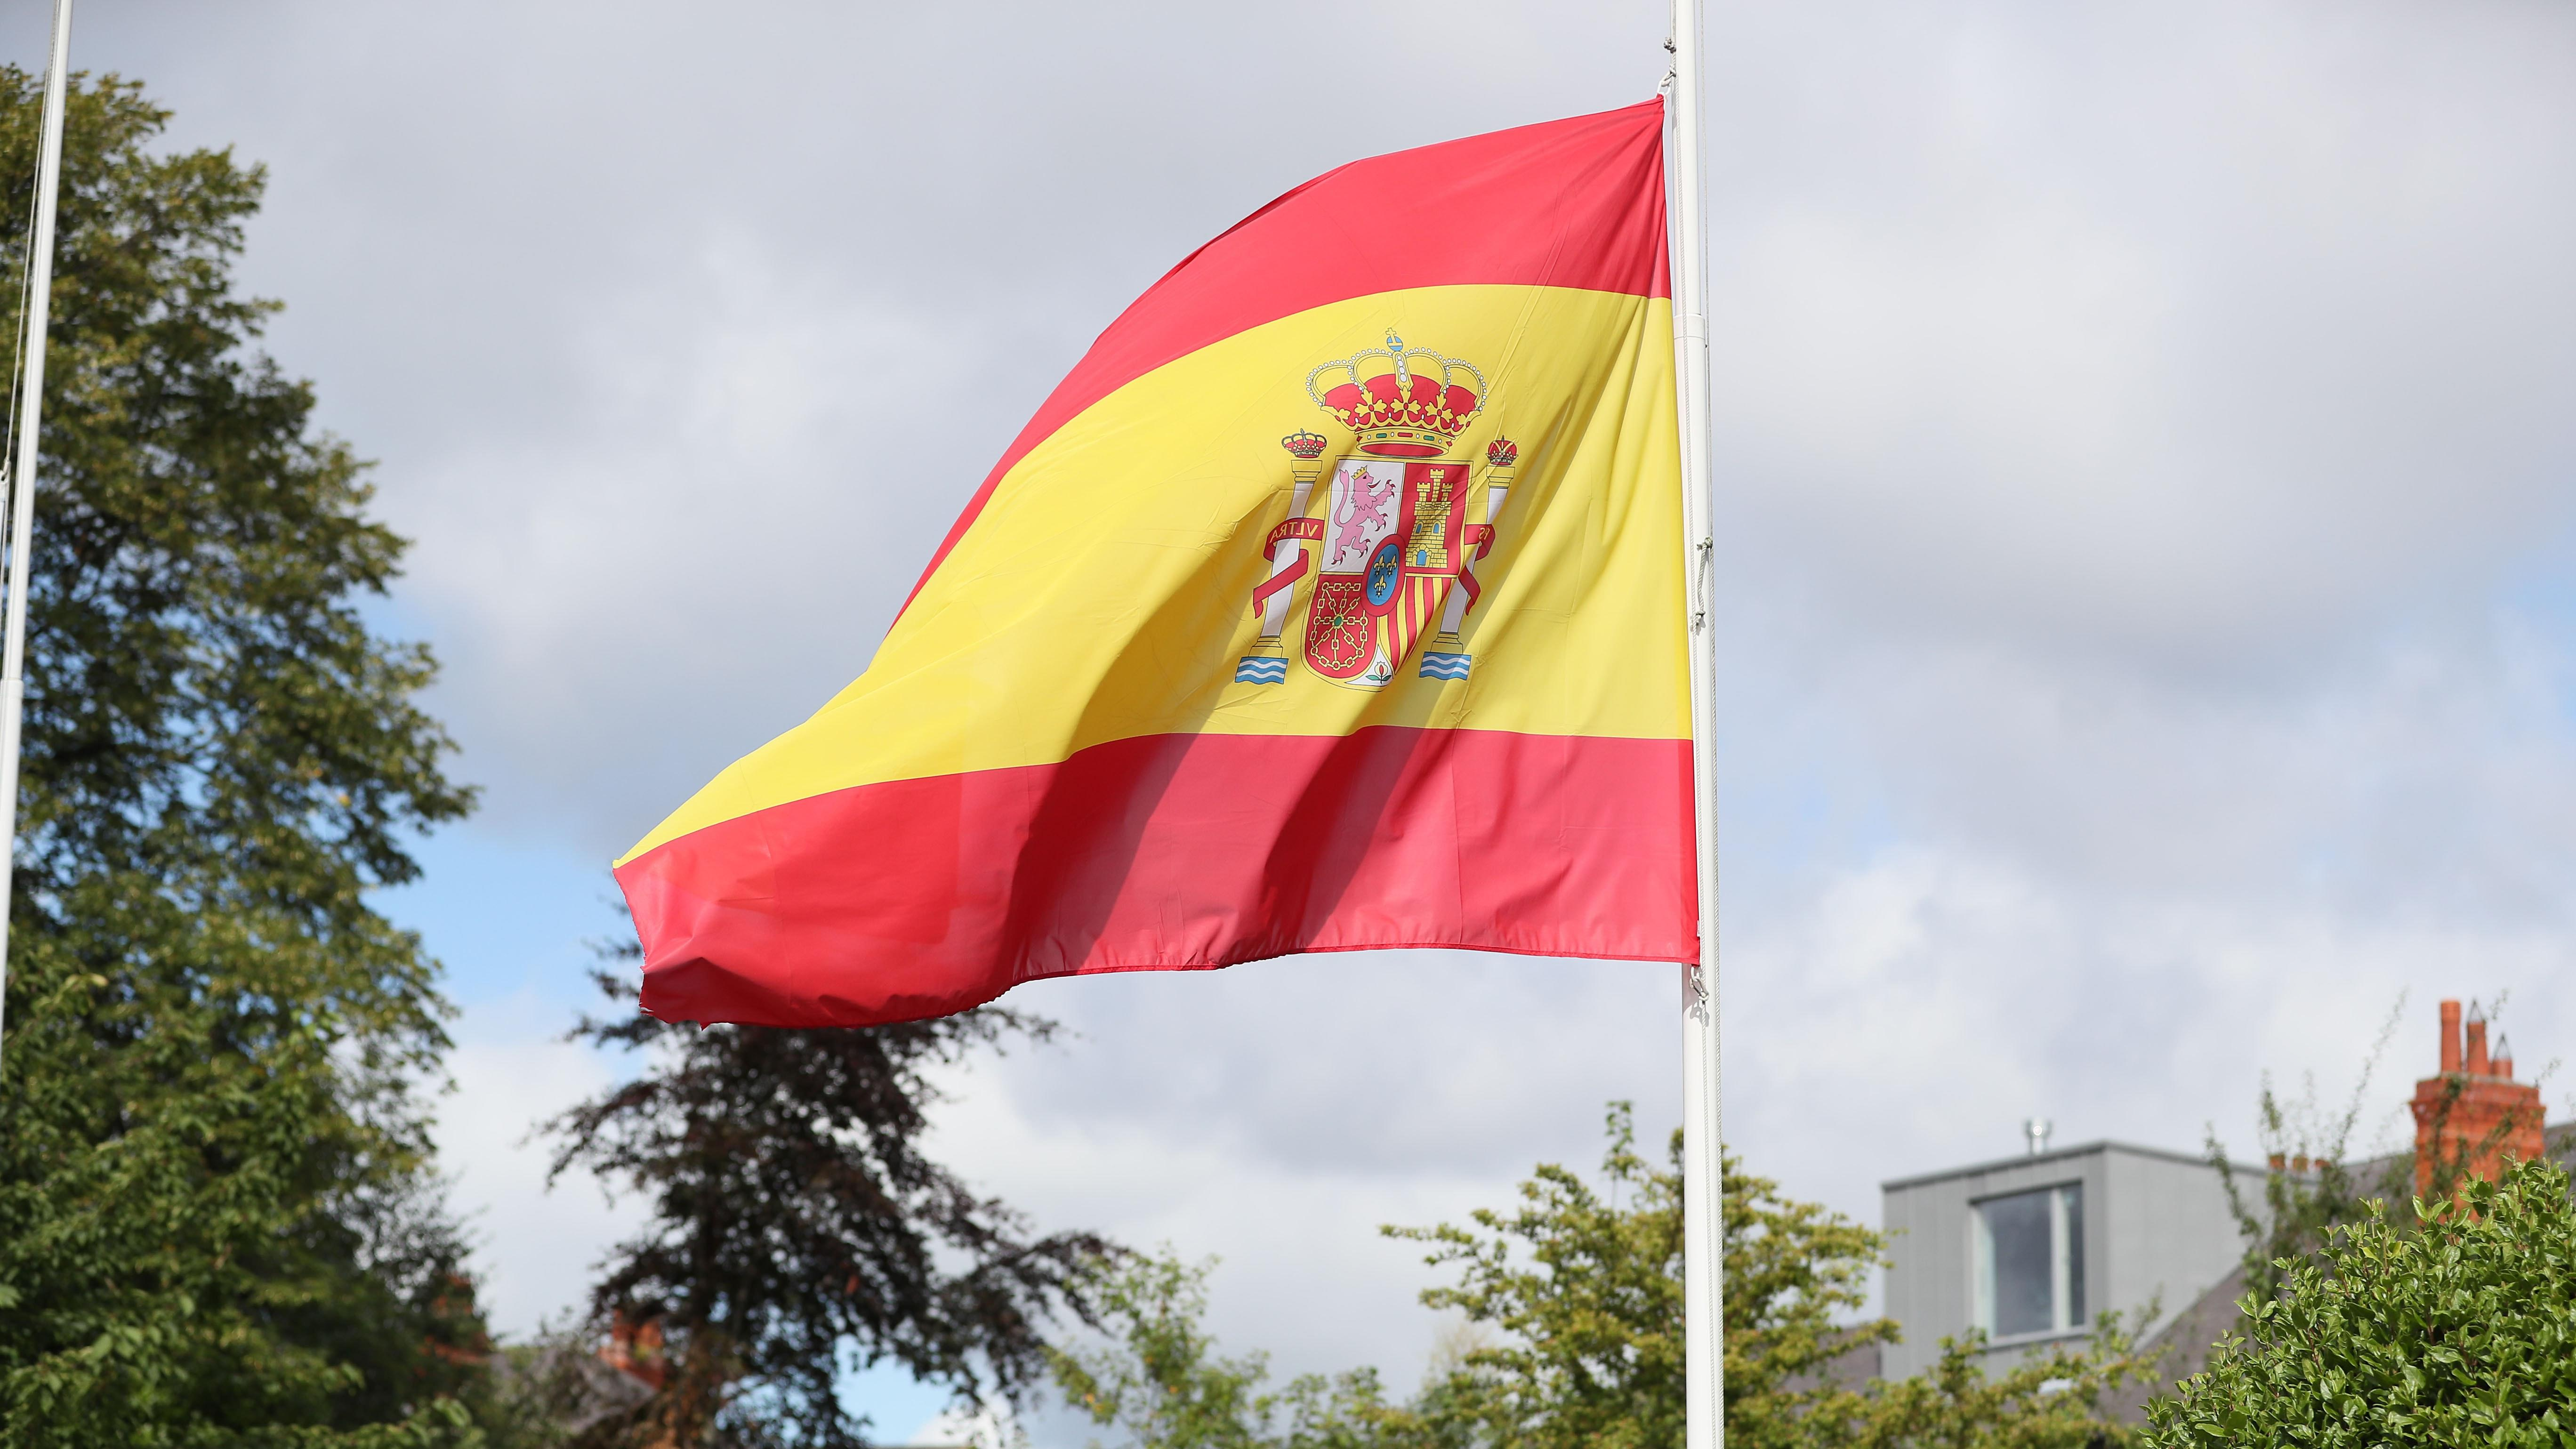 28 people hurt after fair ride 'falls apart' near Seville